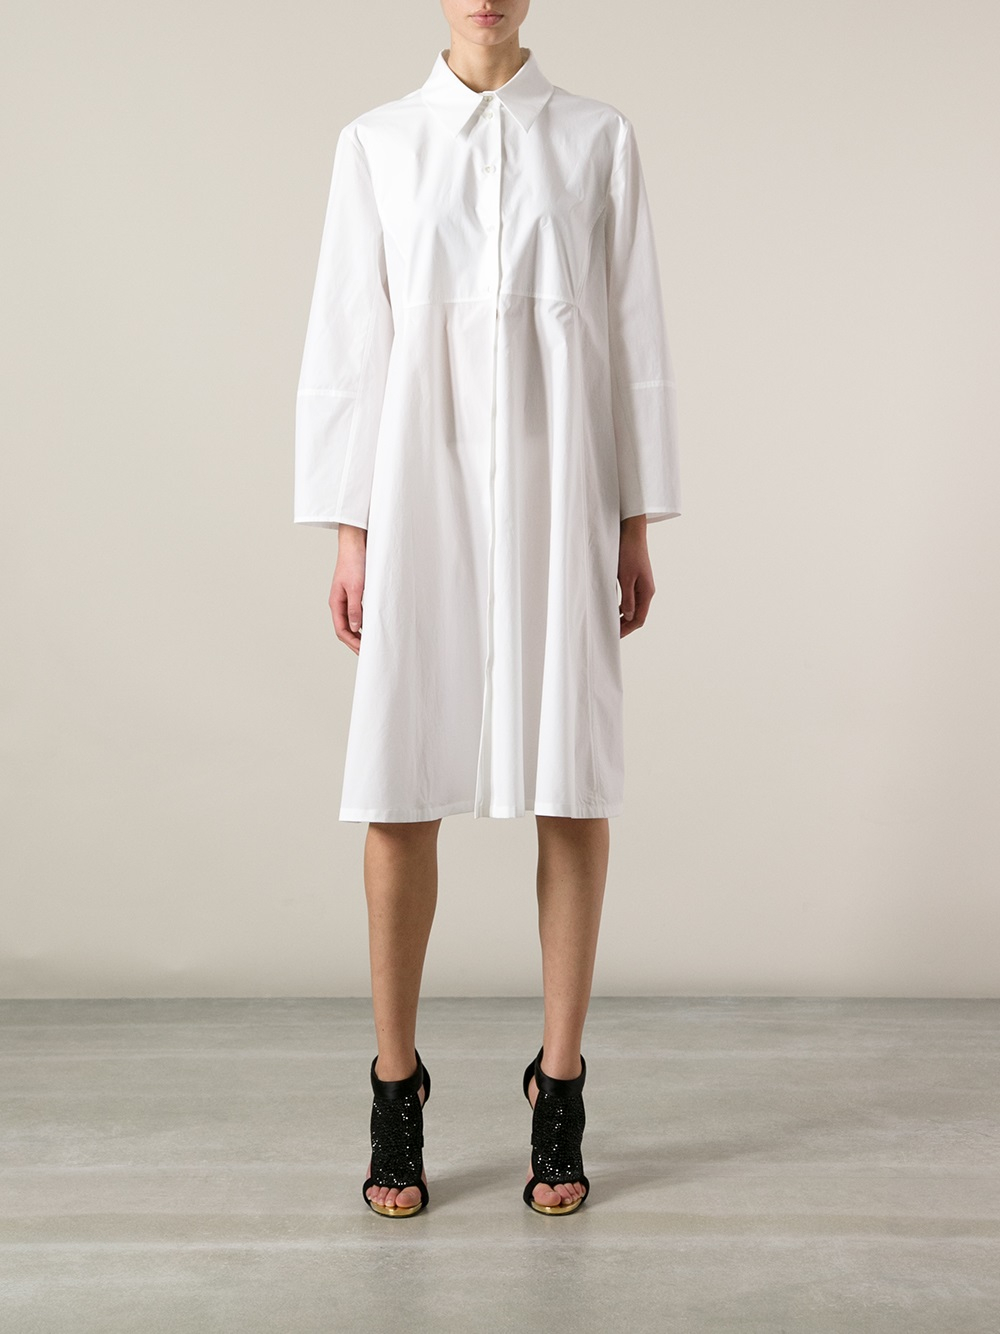 Lyst Antonio Marras Long Sleeve Shirt Dress In White